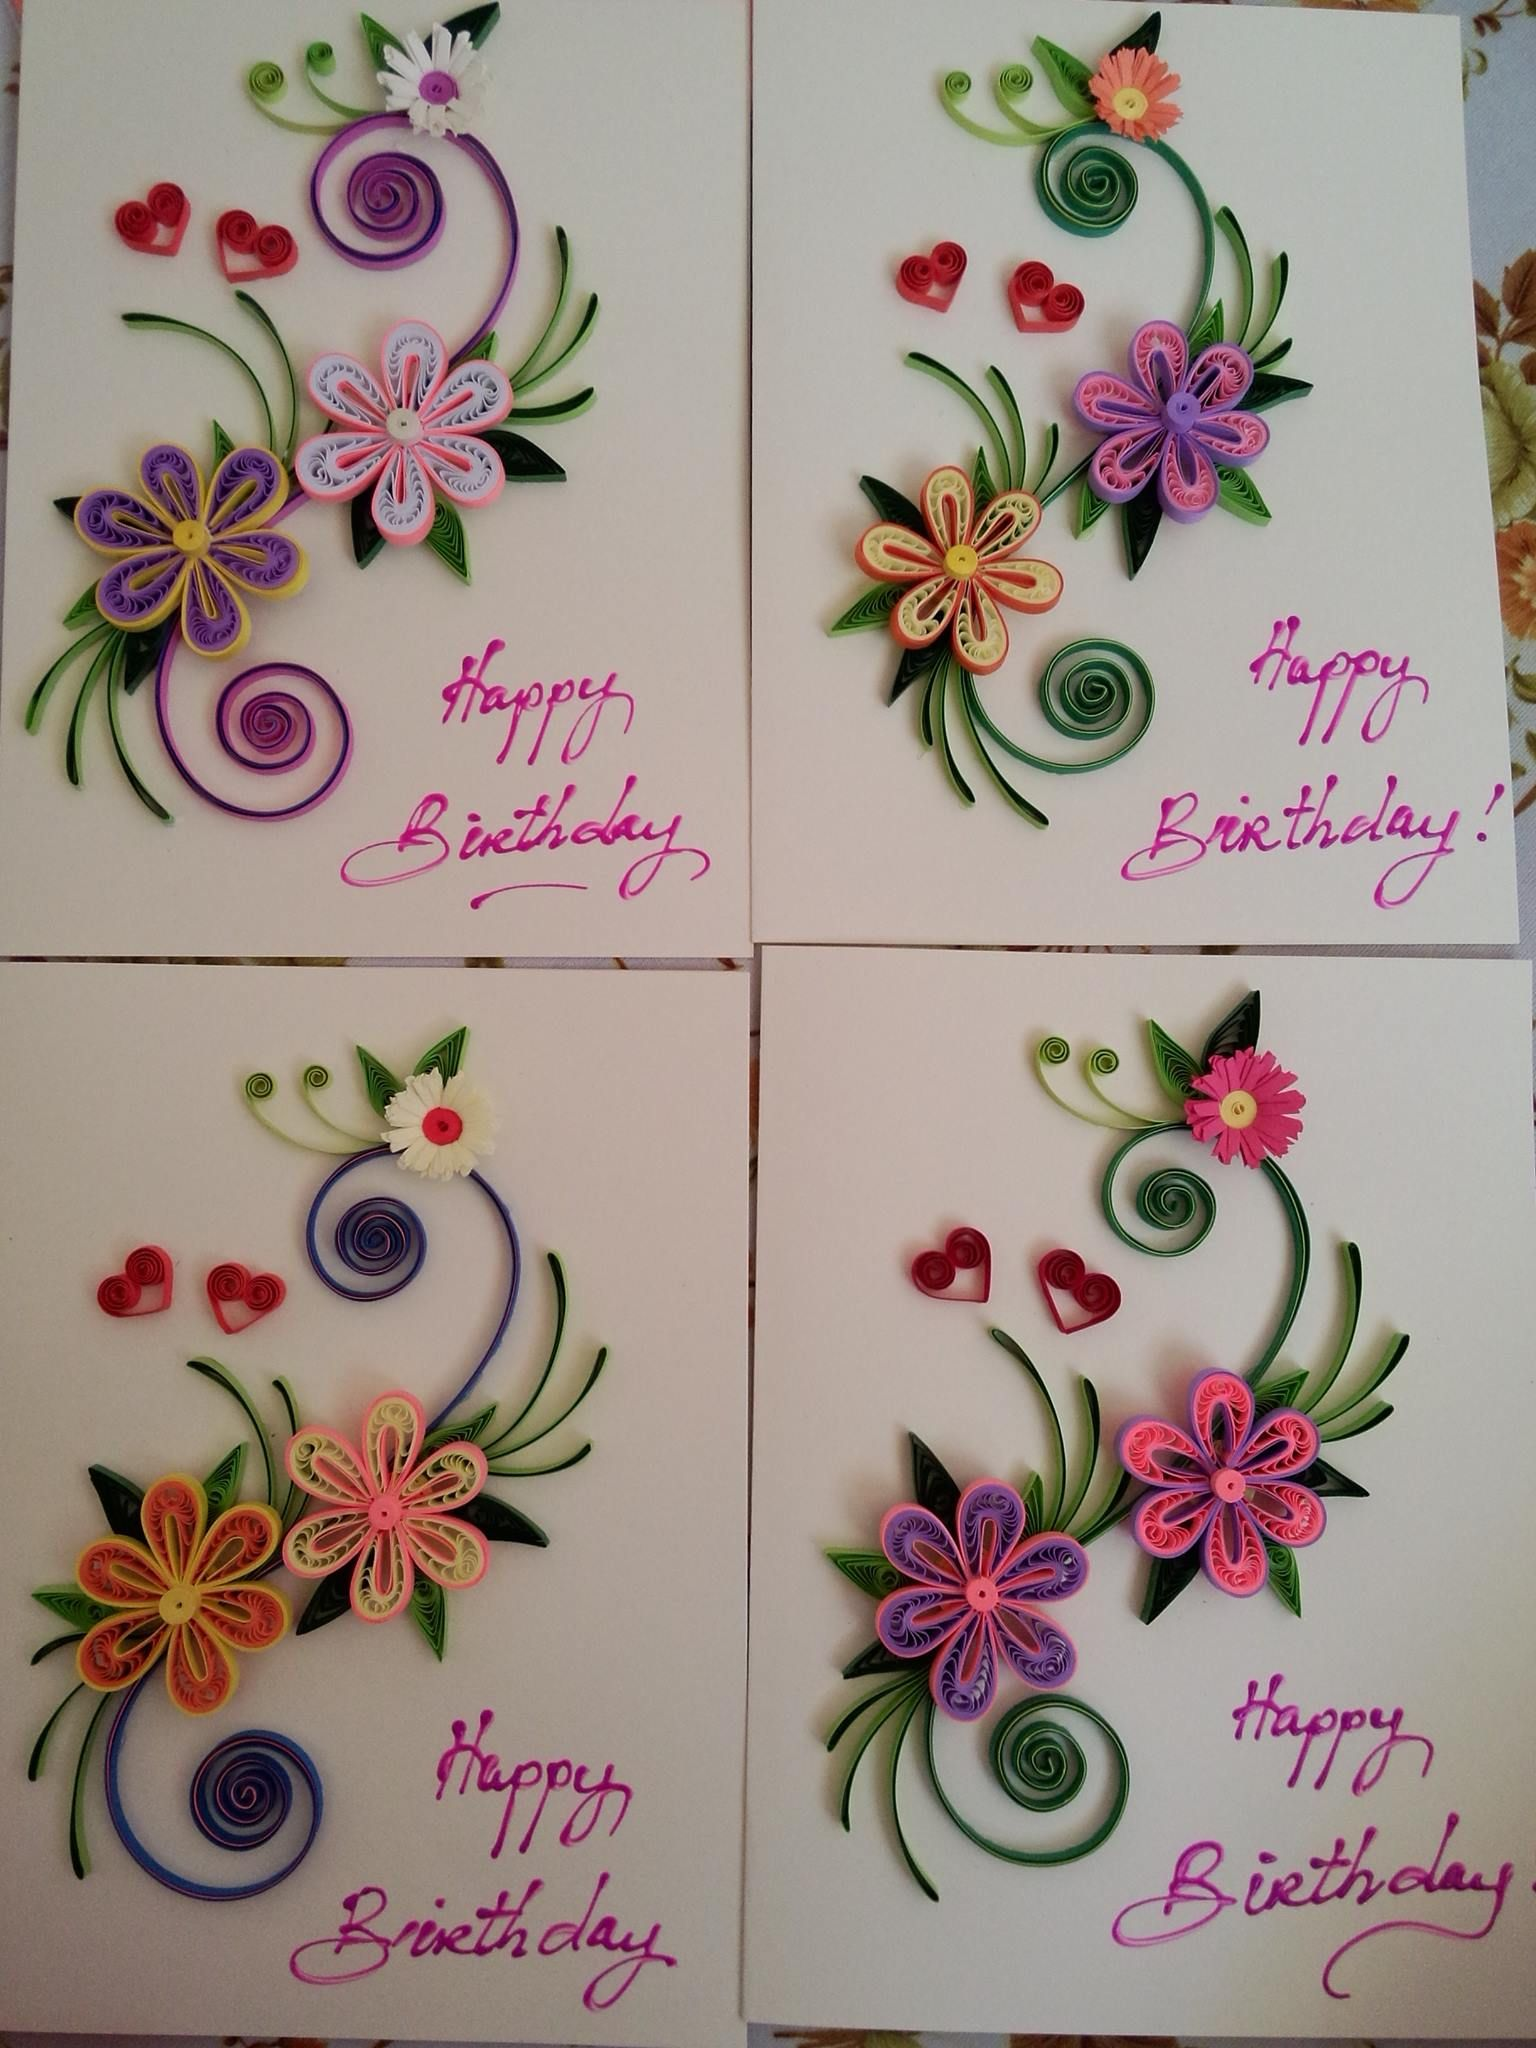 Pin by Aakansha Jain on Card Making Pinterest